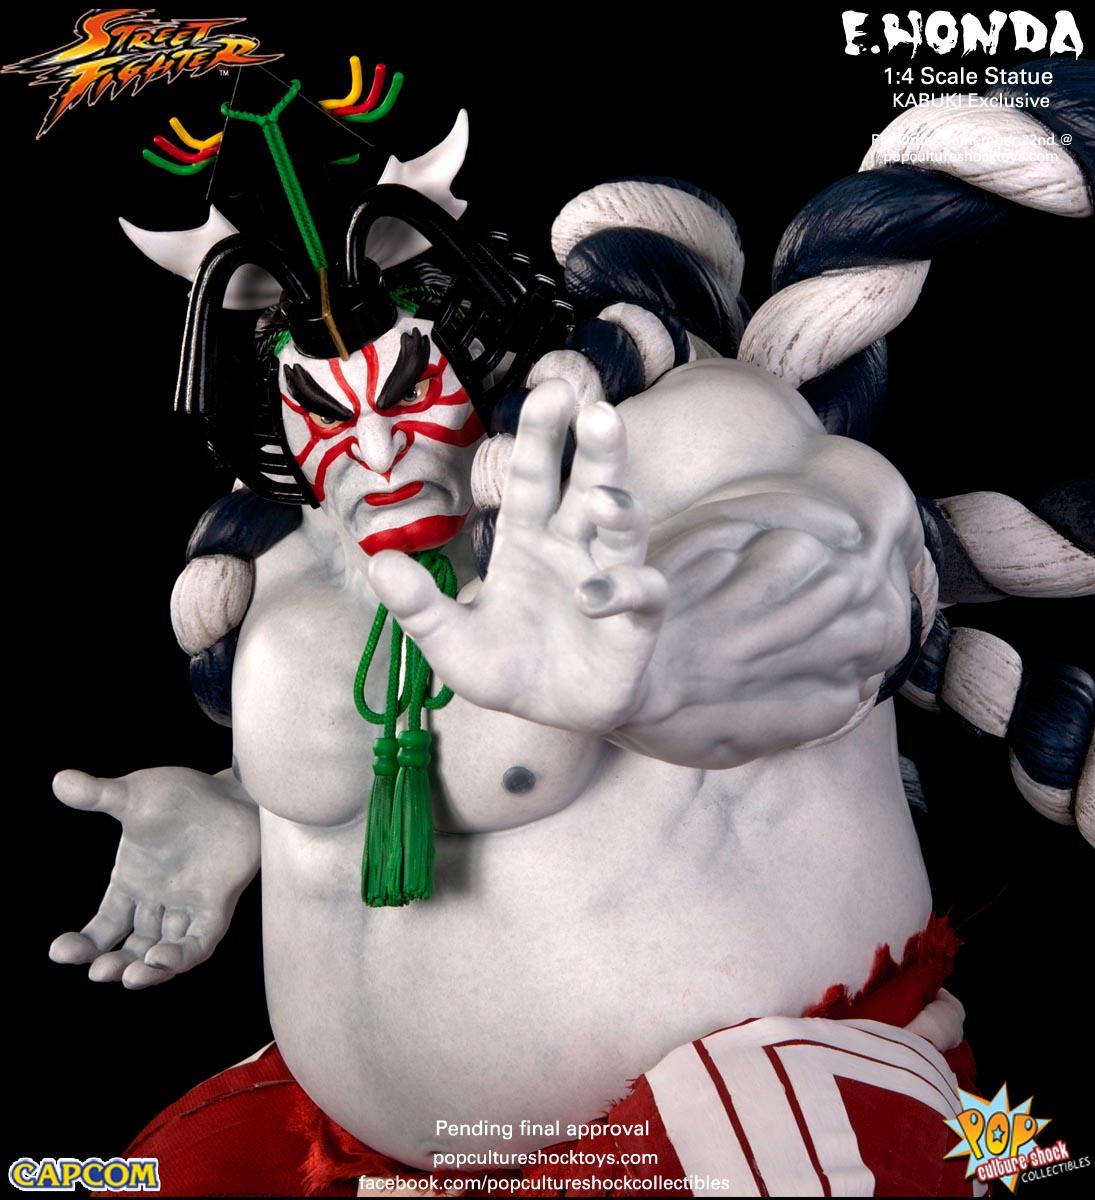 [Pop Culture Shock] Street Fighter: E. Honda 1/4 Statue - Página 3 Street-Fighter-E.-Honda-Kabuki-Statue-017